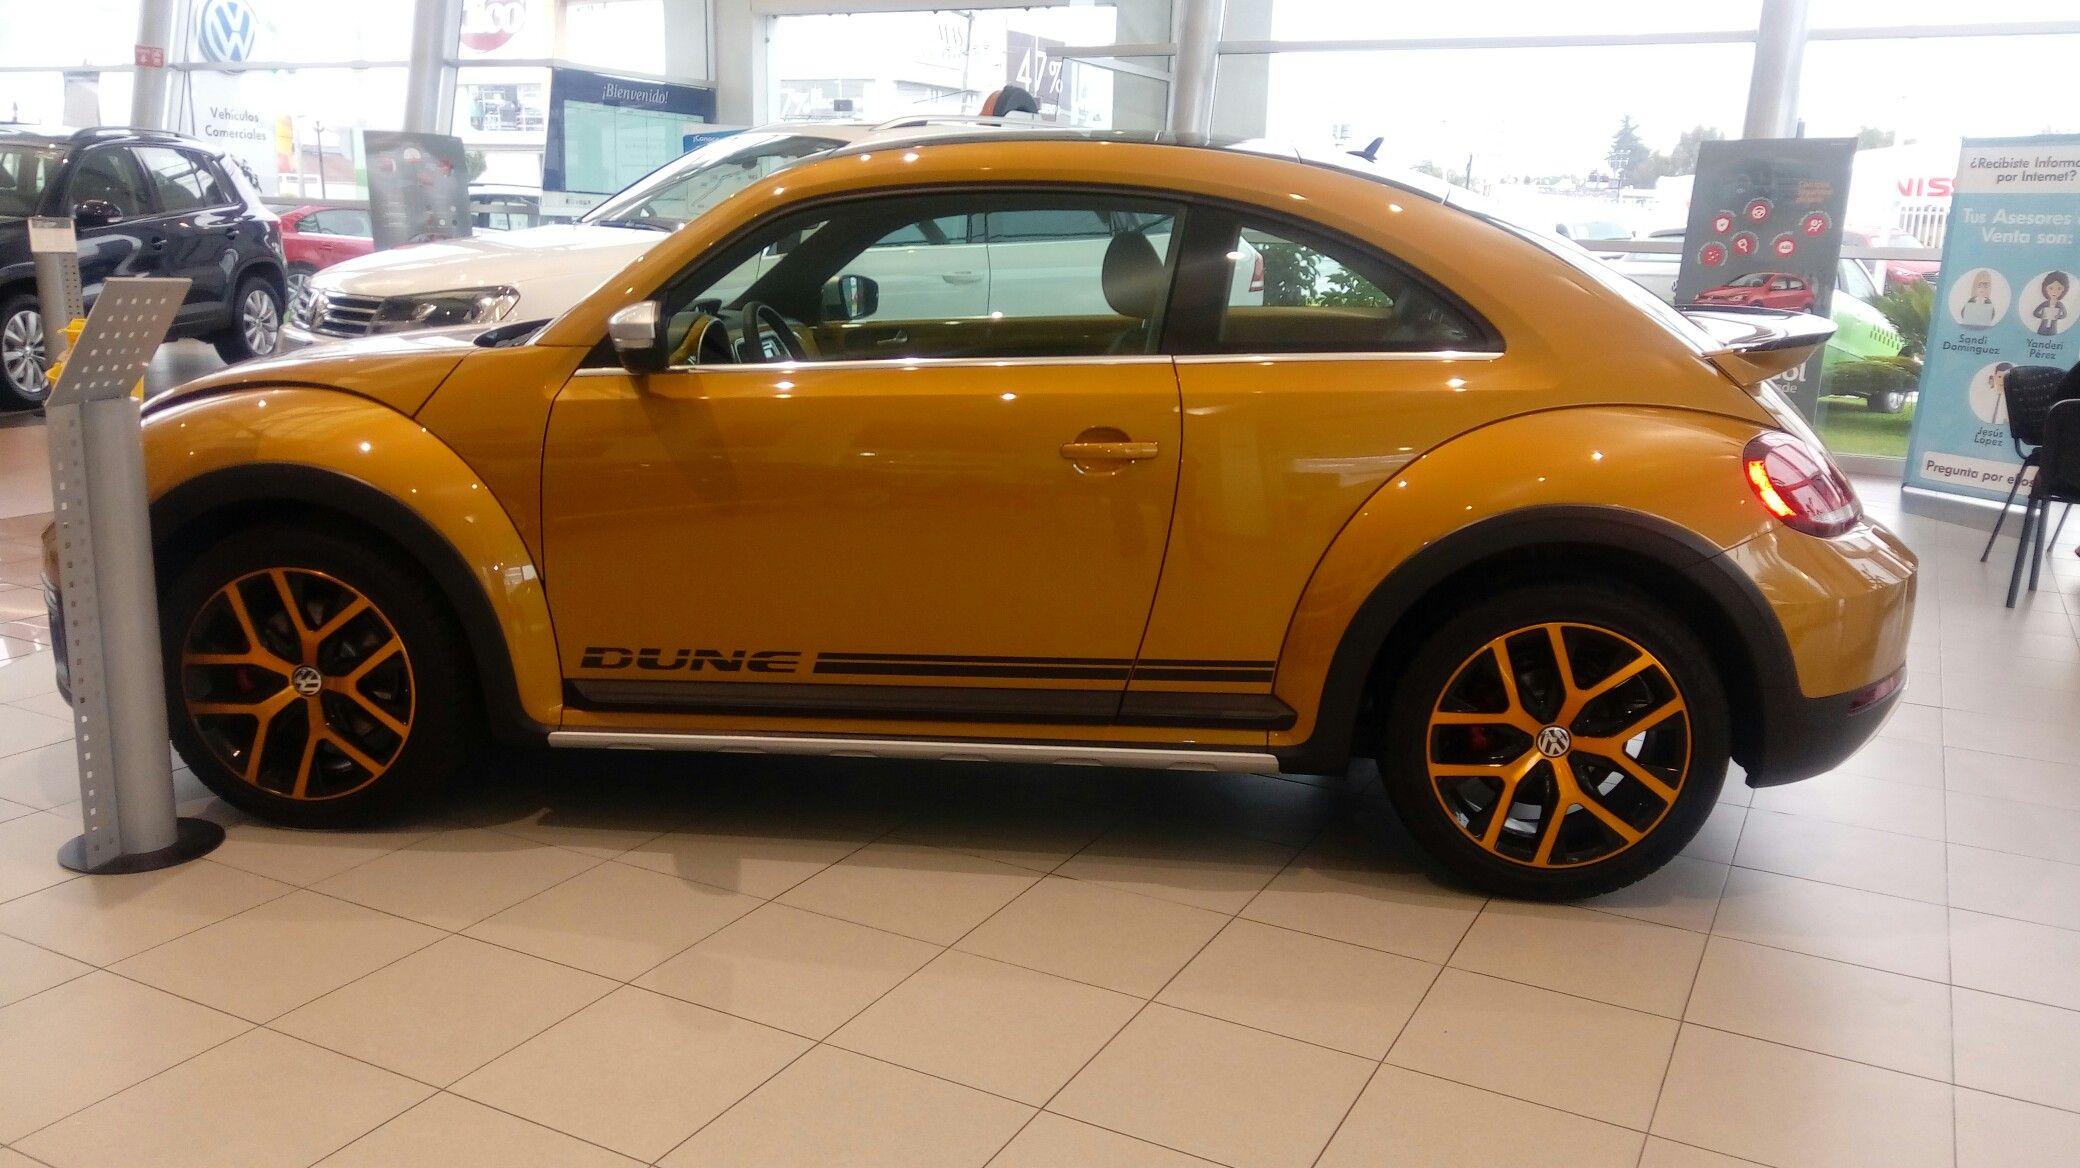 VW Beetle 2017 DUNE version Cool